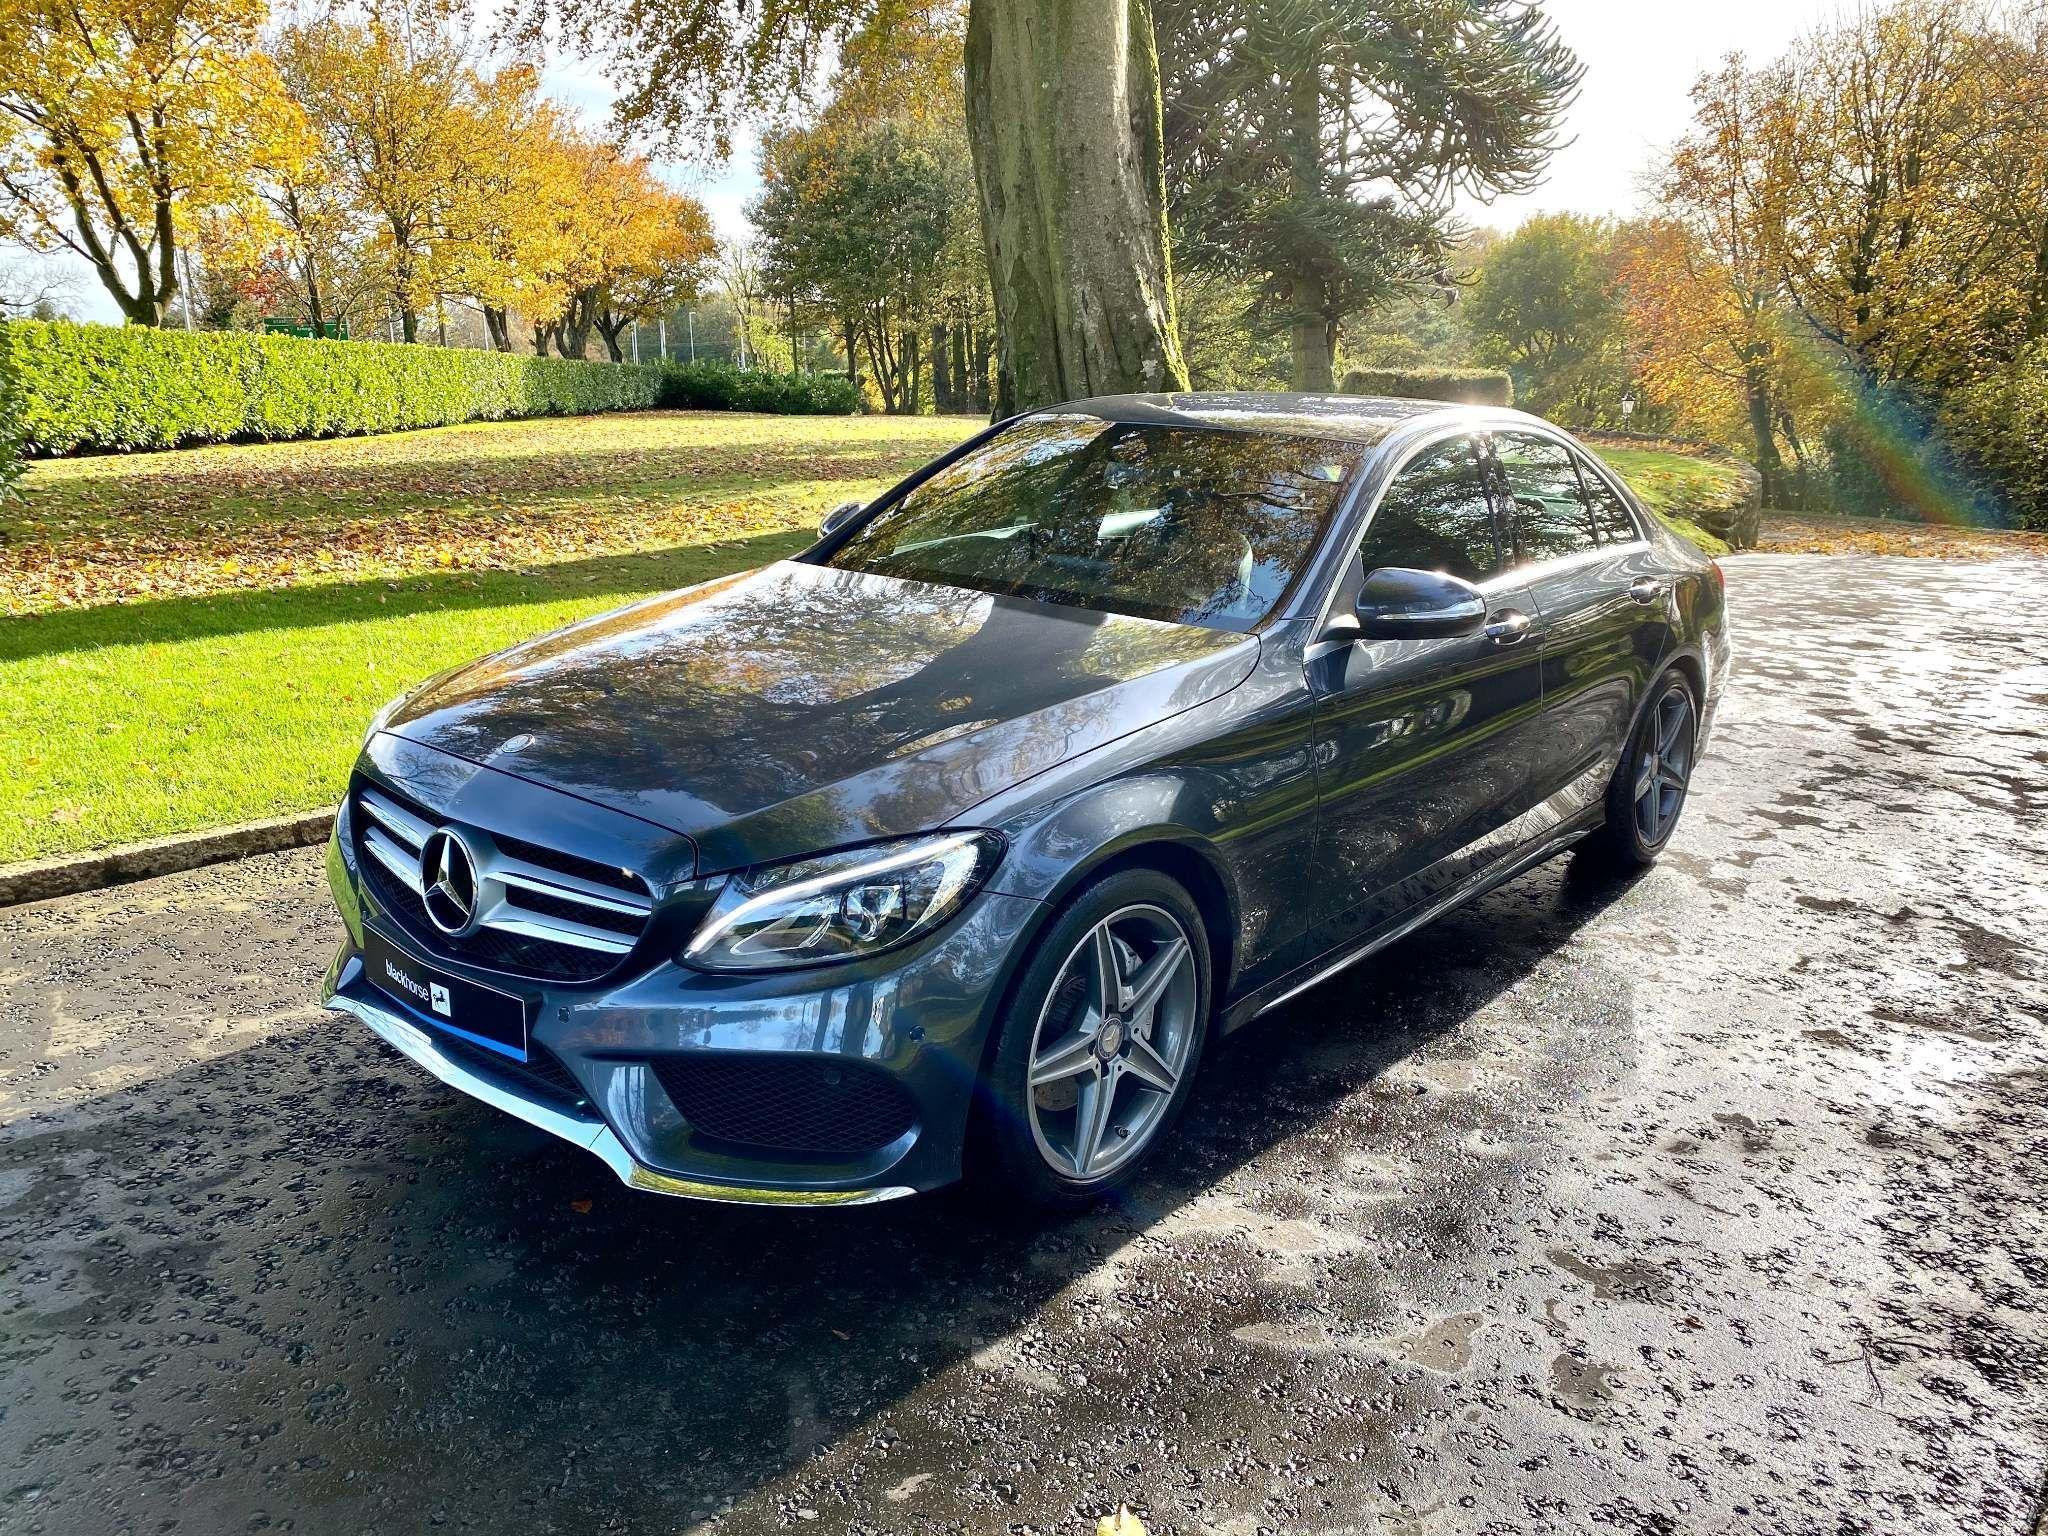 2014 Mercedes-Benz C Class 2.1 C220 CDI BlueTEC AMG Line G-Tronic+ (s/s) 4dr Diesel Automatic – Moyway Motors Dungannon full